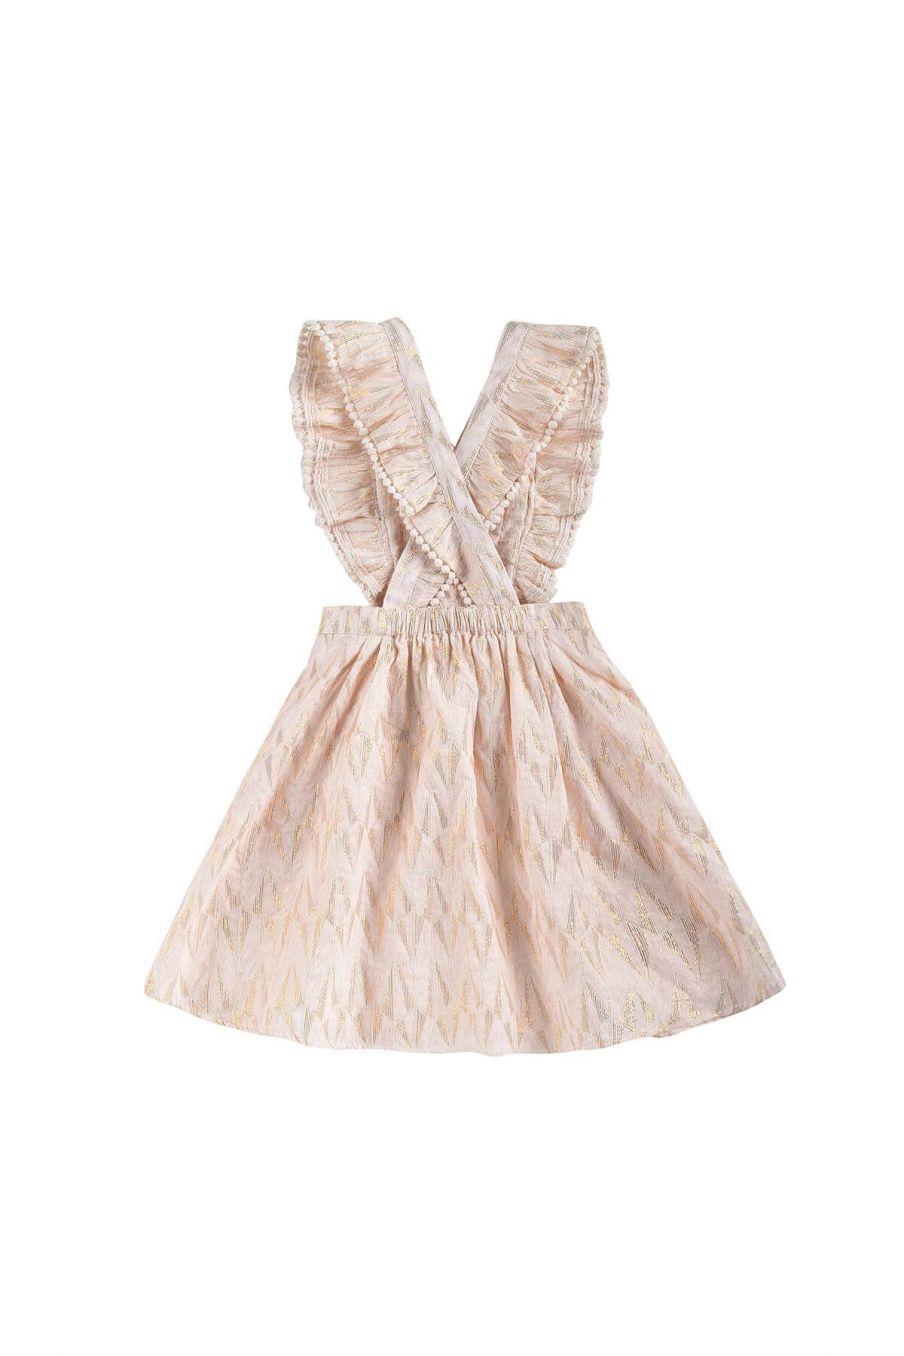 boheme chic vintage robe fille asili blush psyche lurex